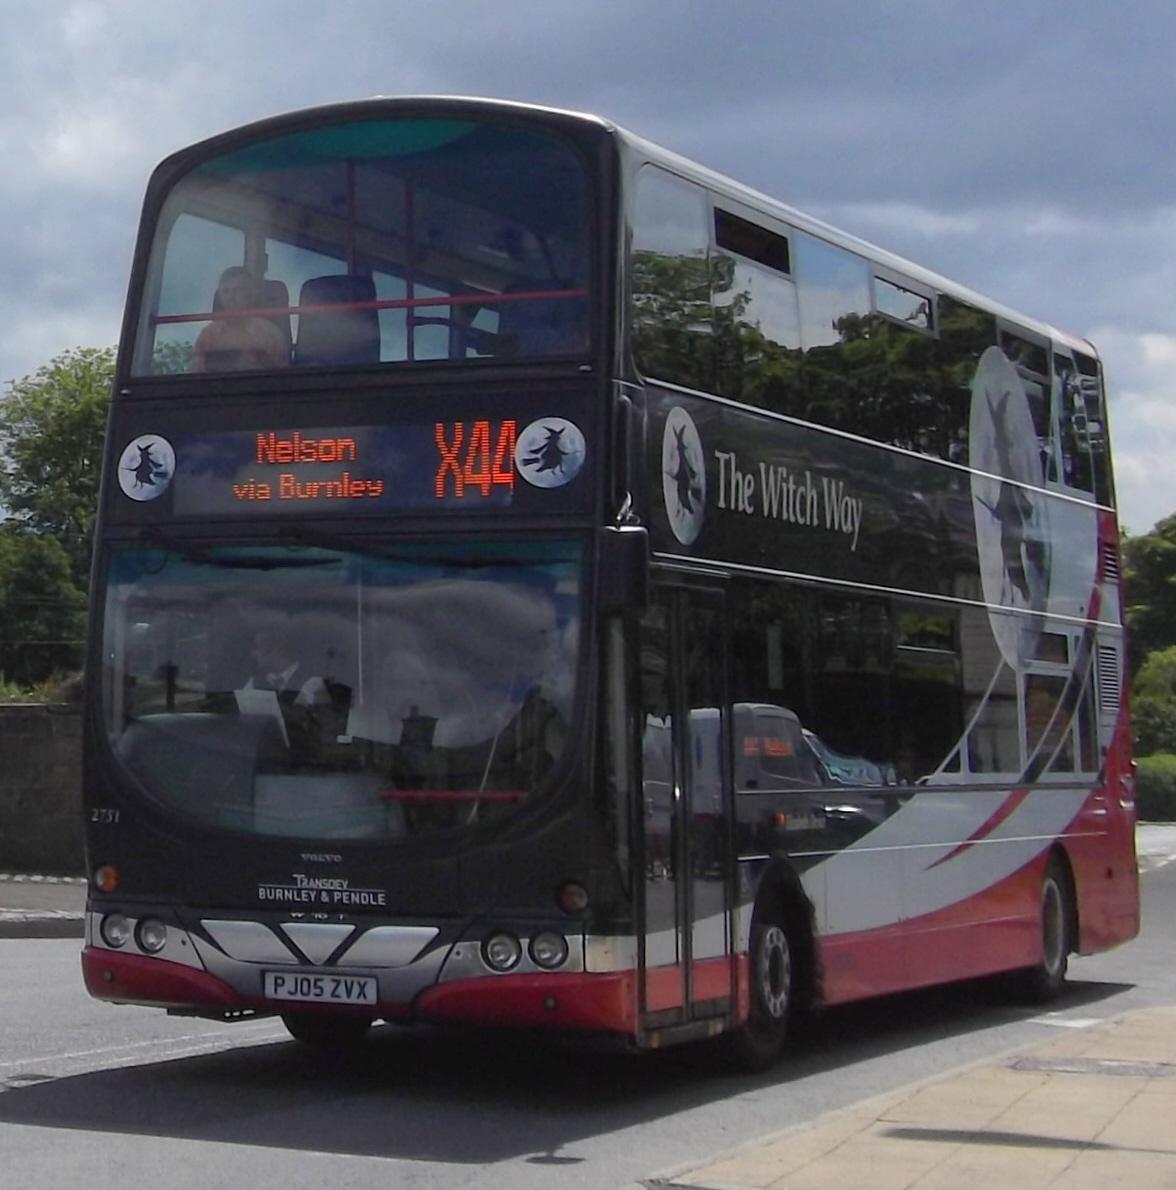 File:Burnley & Pendle bus 2751 (PJ05 ZVX) 2005 Volvo B7TL Wrightbus Eclipse